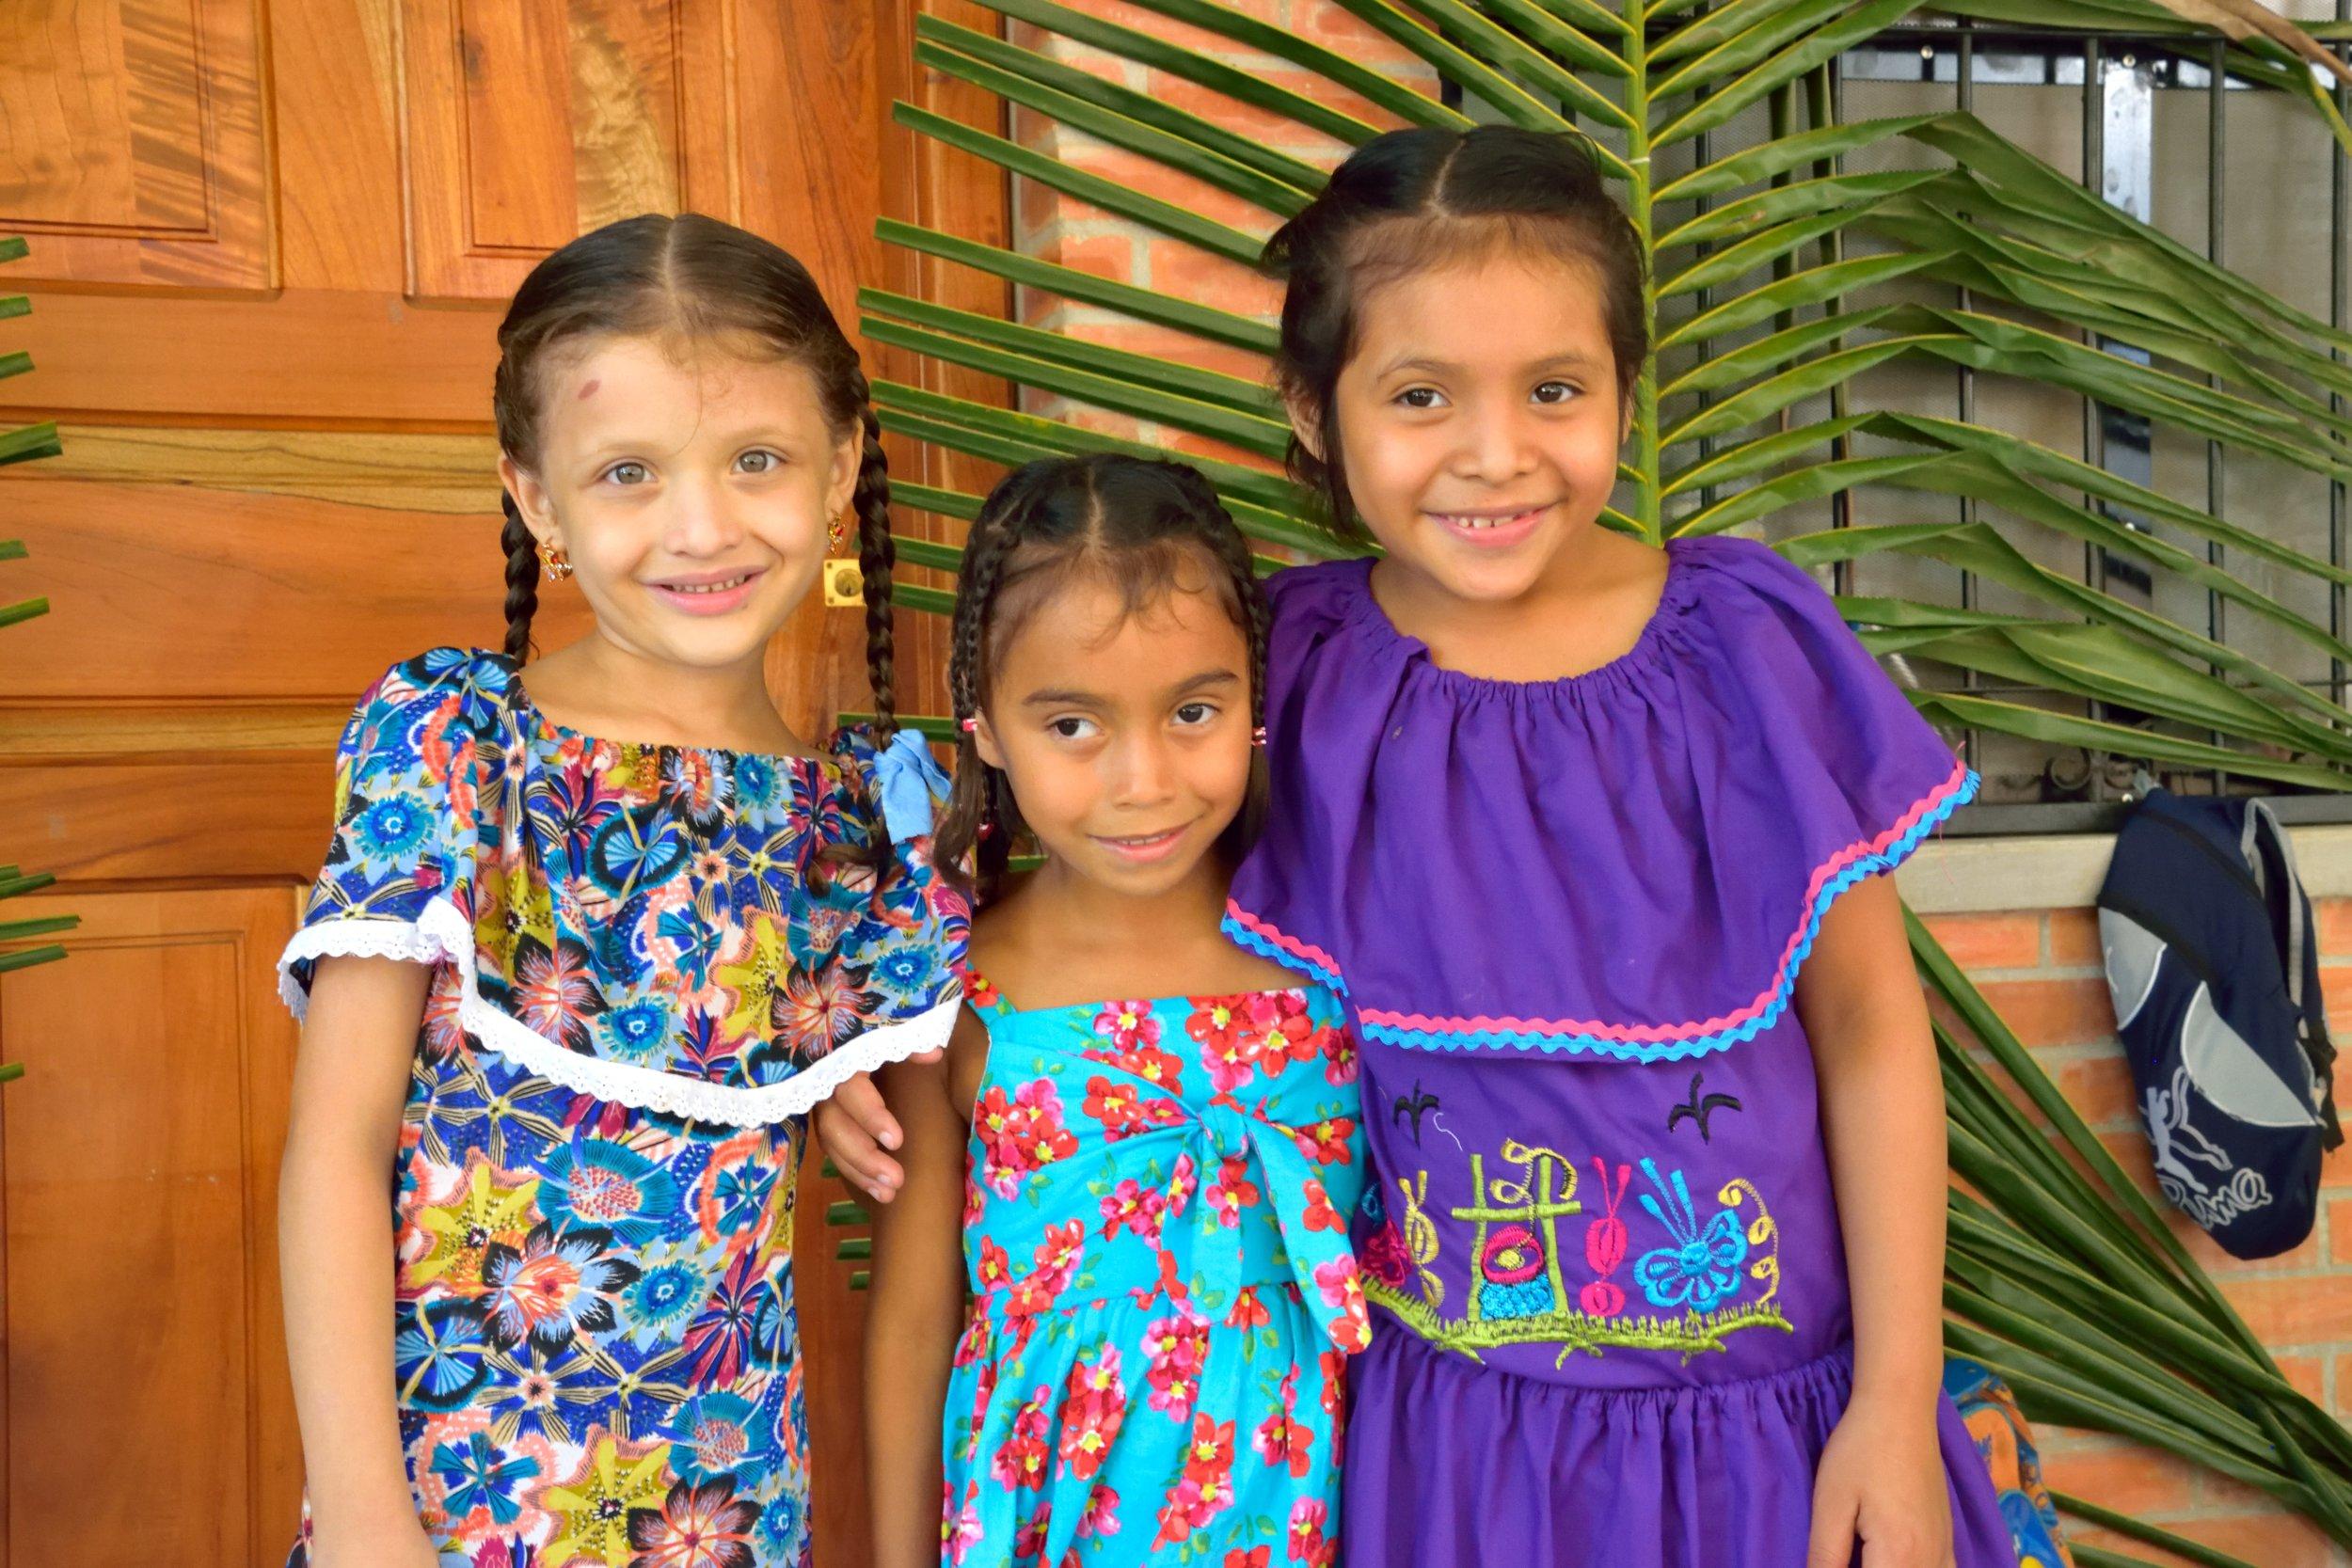 Celebrating 'Día del indio Lempira', or Lempira Day with some of her classmates at the Amigos de Jesús Bilingual School last June.